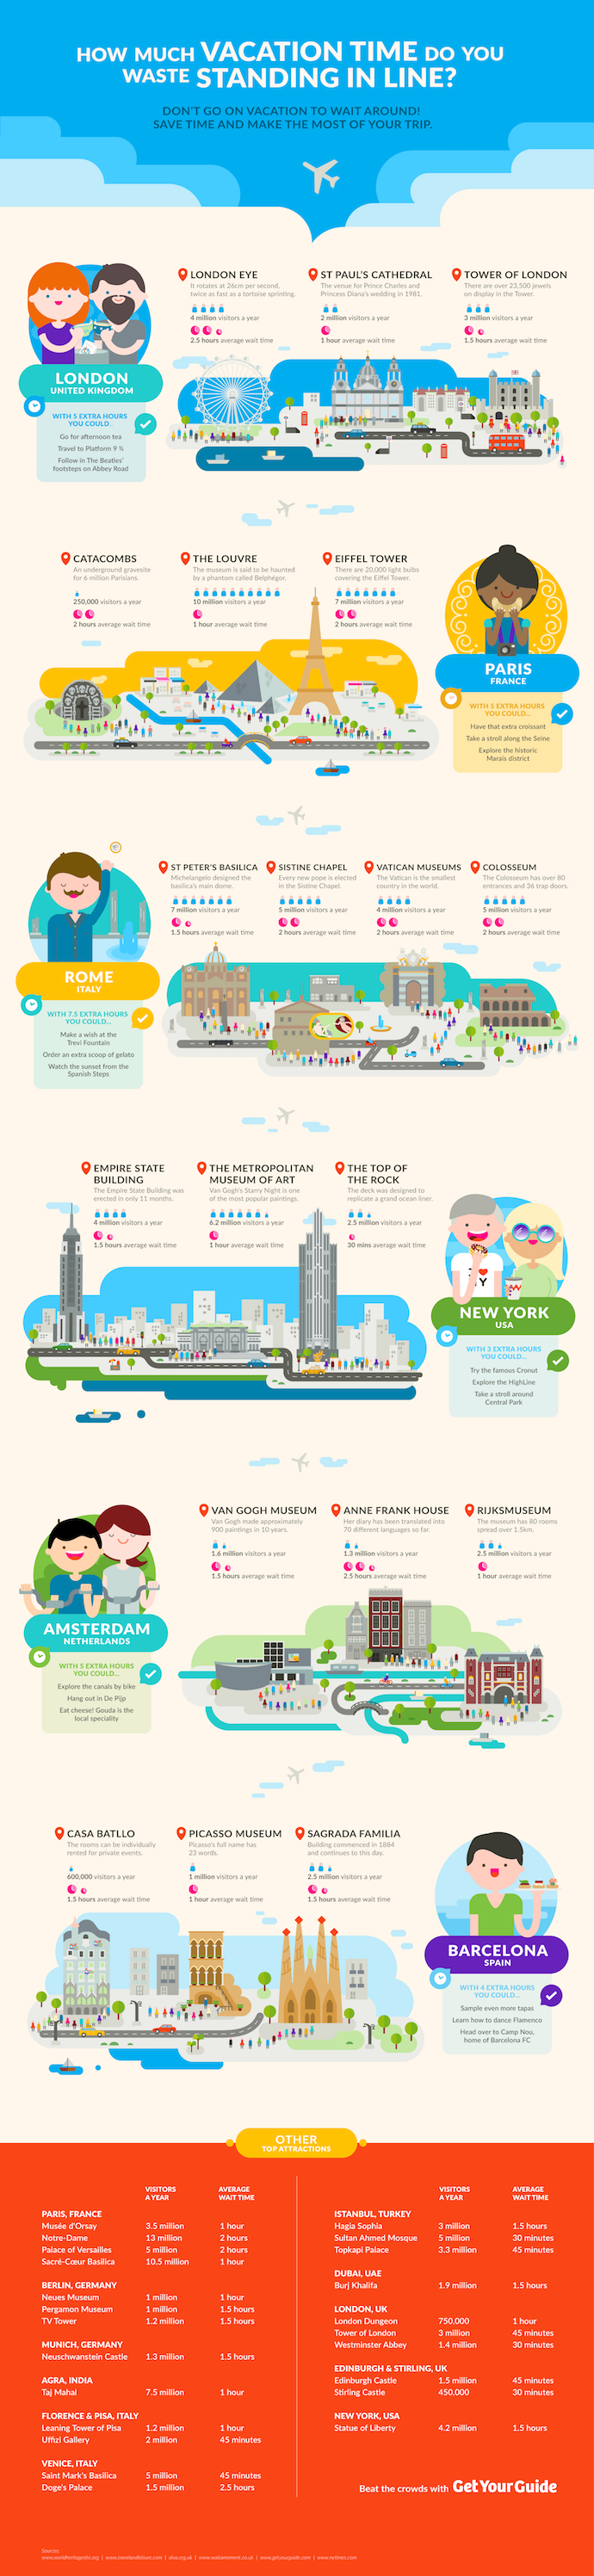 average wait times tourist attractions